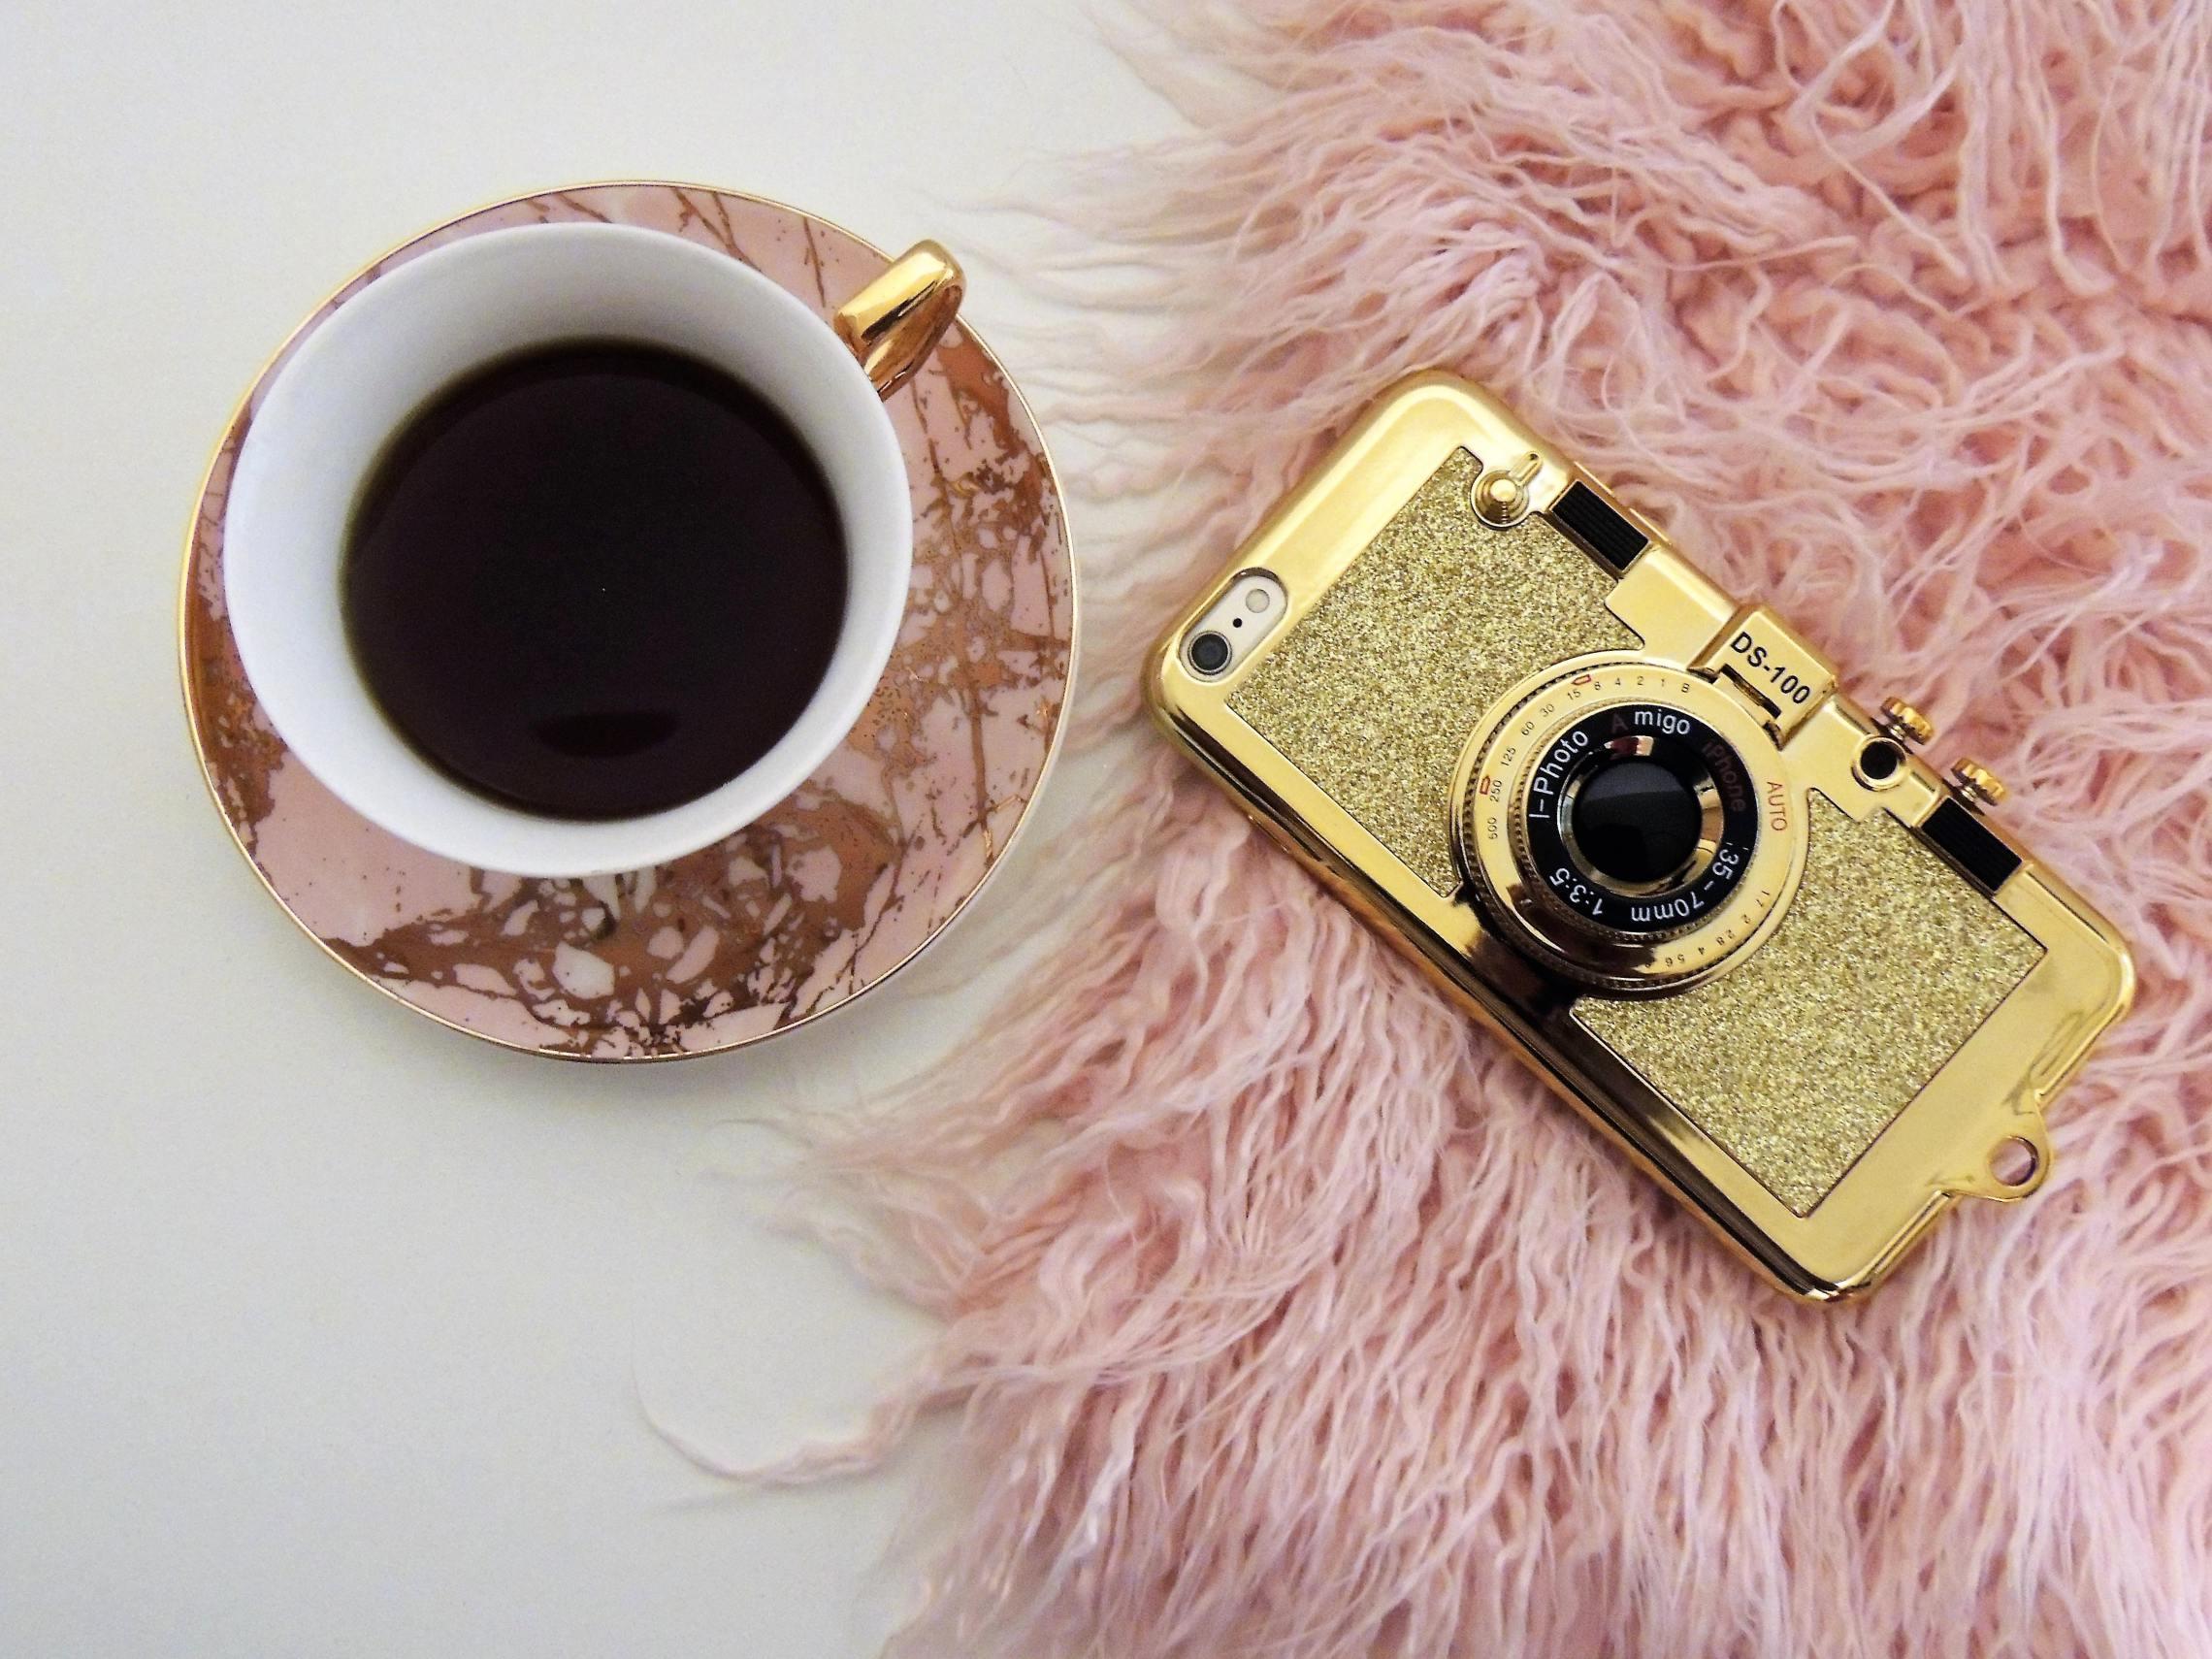 black-coffee-caffeine-camera-915162.jpg